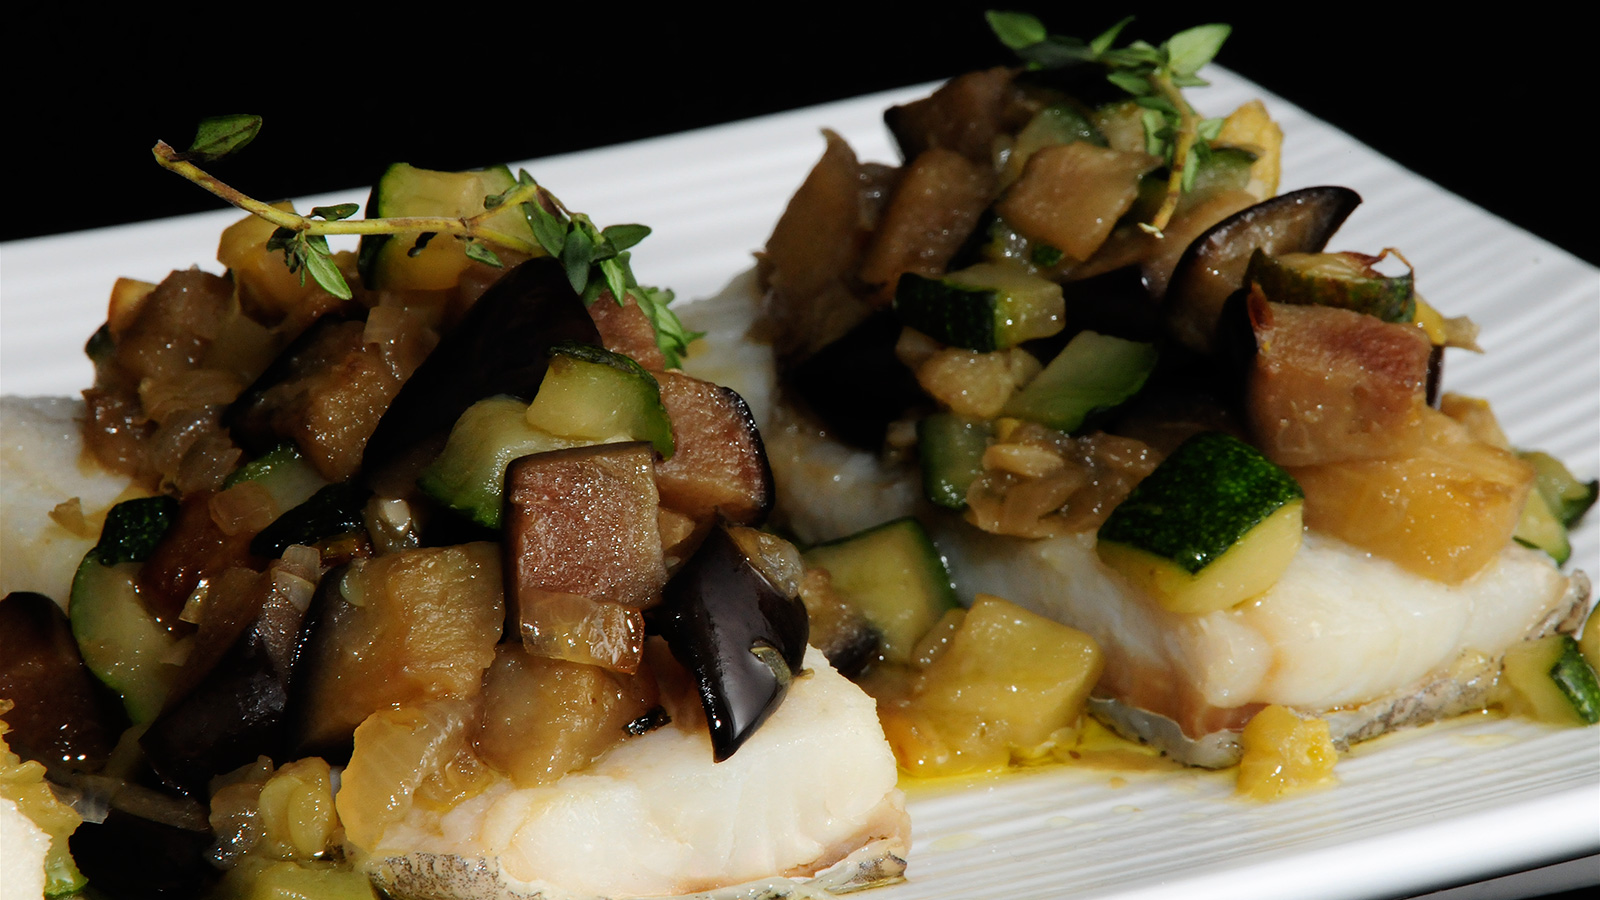 Bacalao con pisto diana cabrera video receta canal for Diana cabrera canal cocina